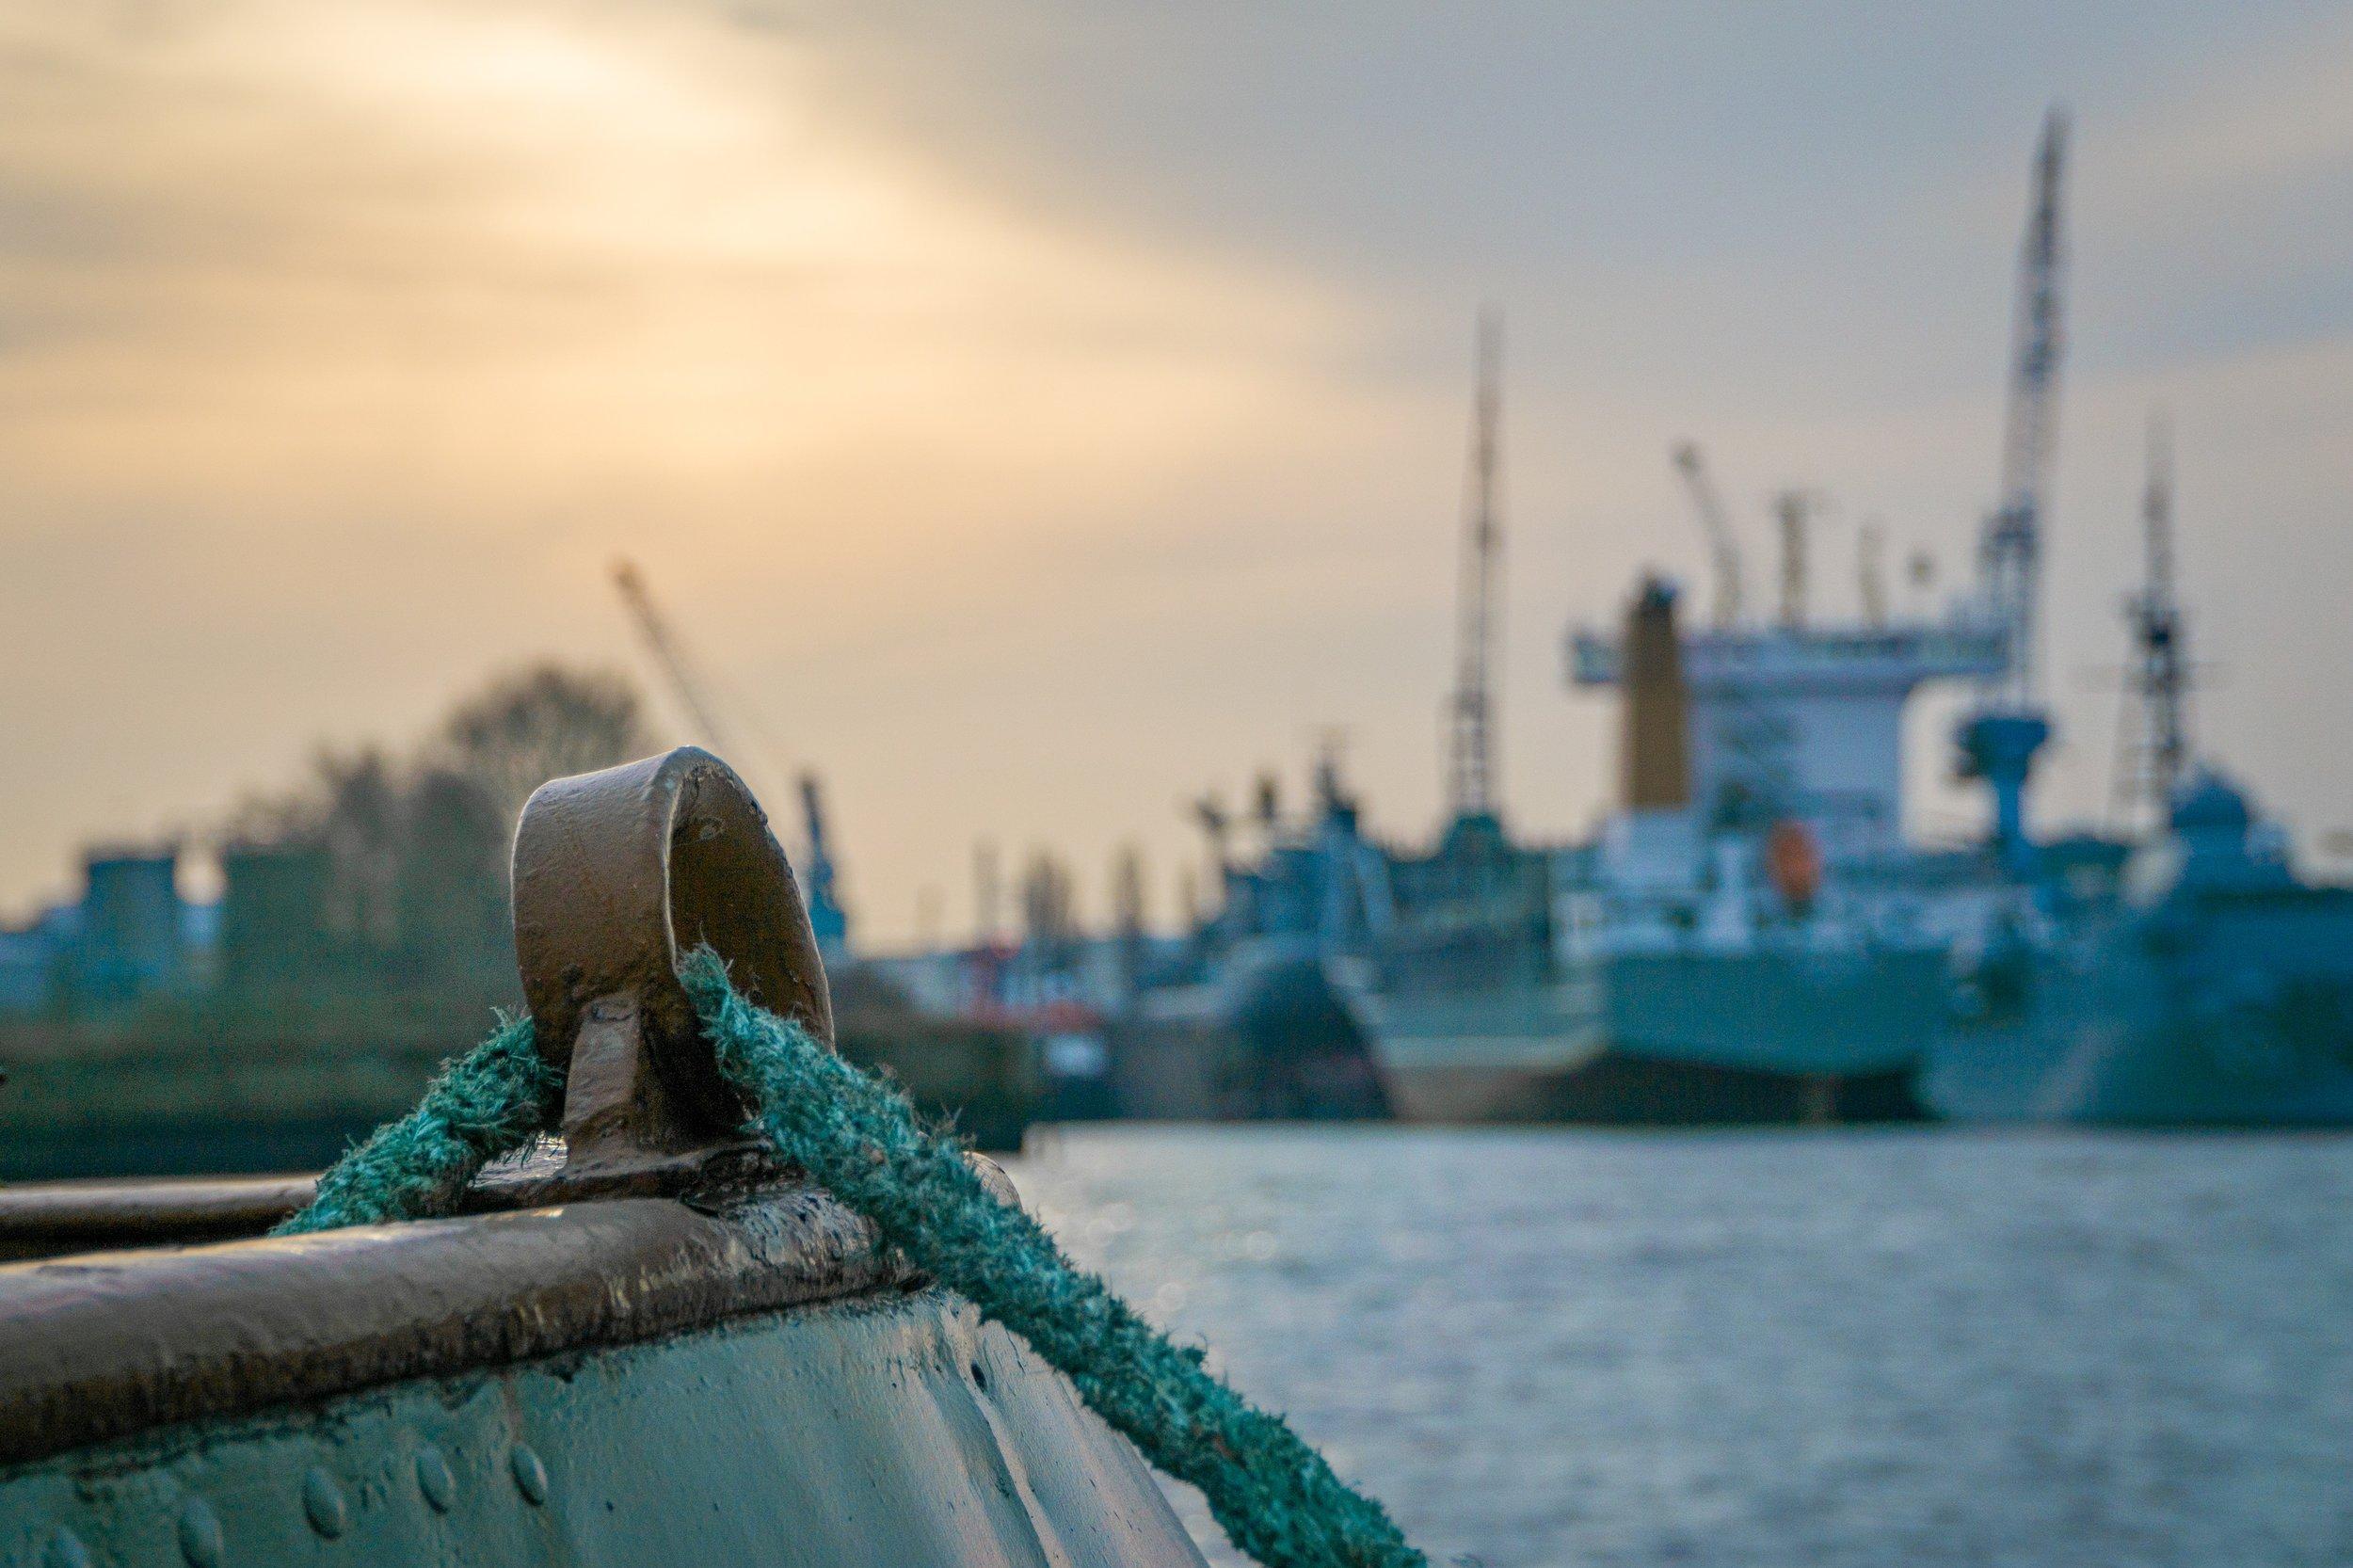 SHIPCHANDLERY -